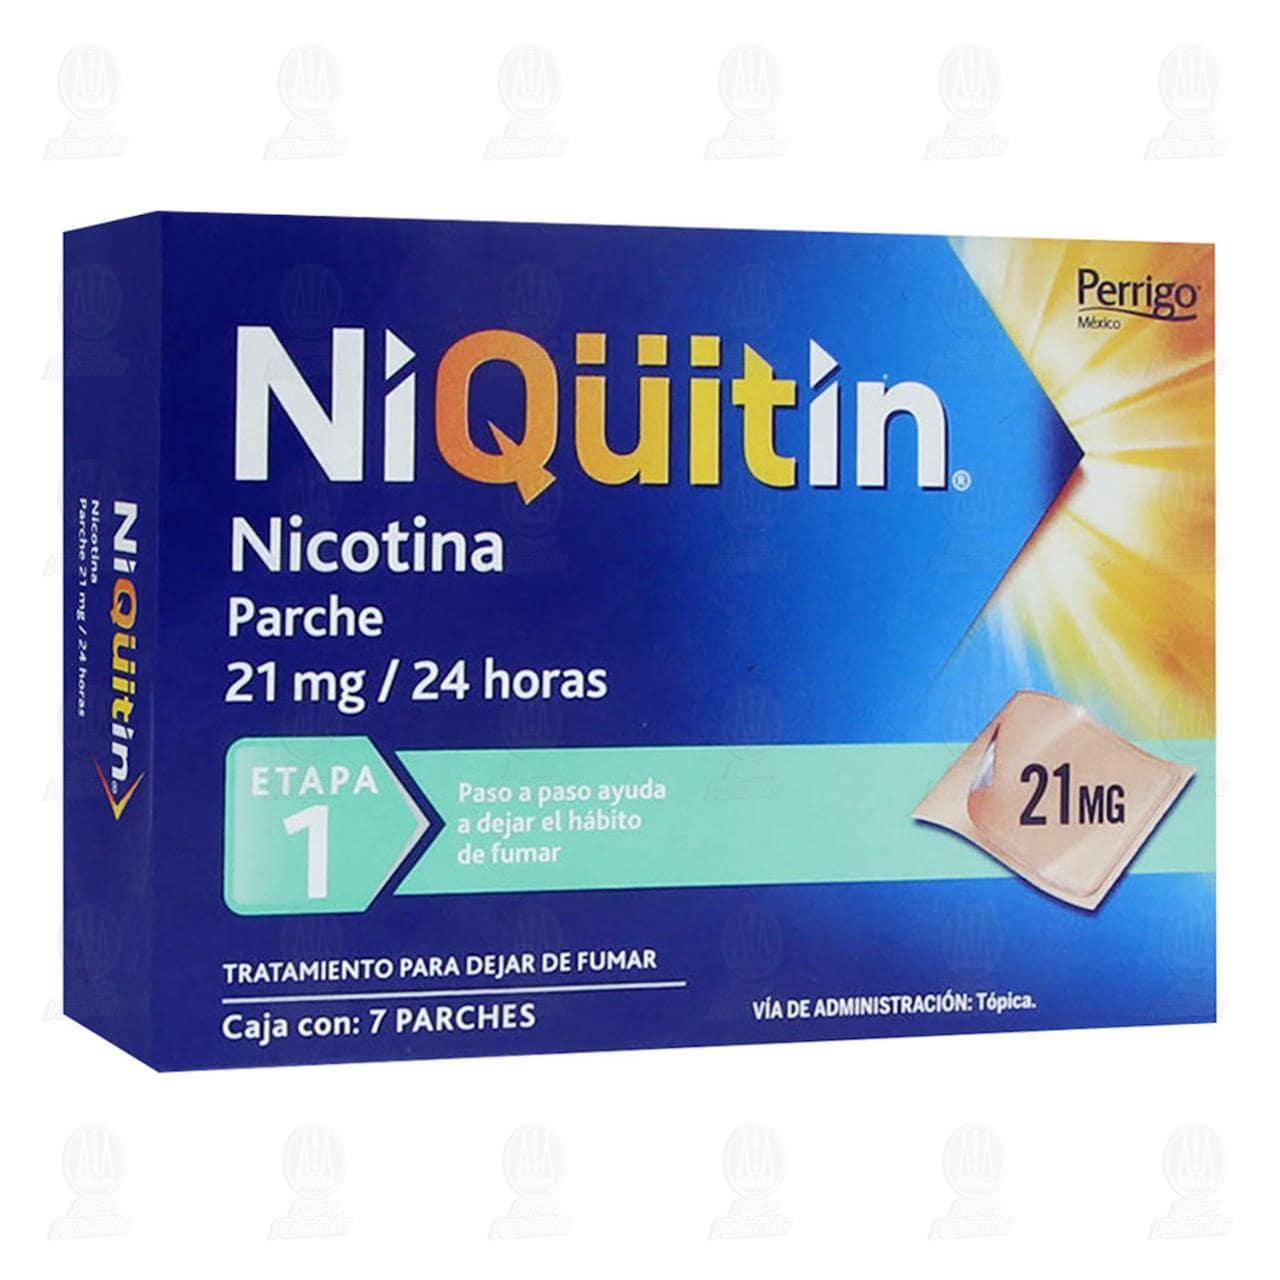 Comprar Niqüitin Etapa 1 21mg/24 Horas 7 Parches en Farmacias Guadalajara